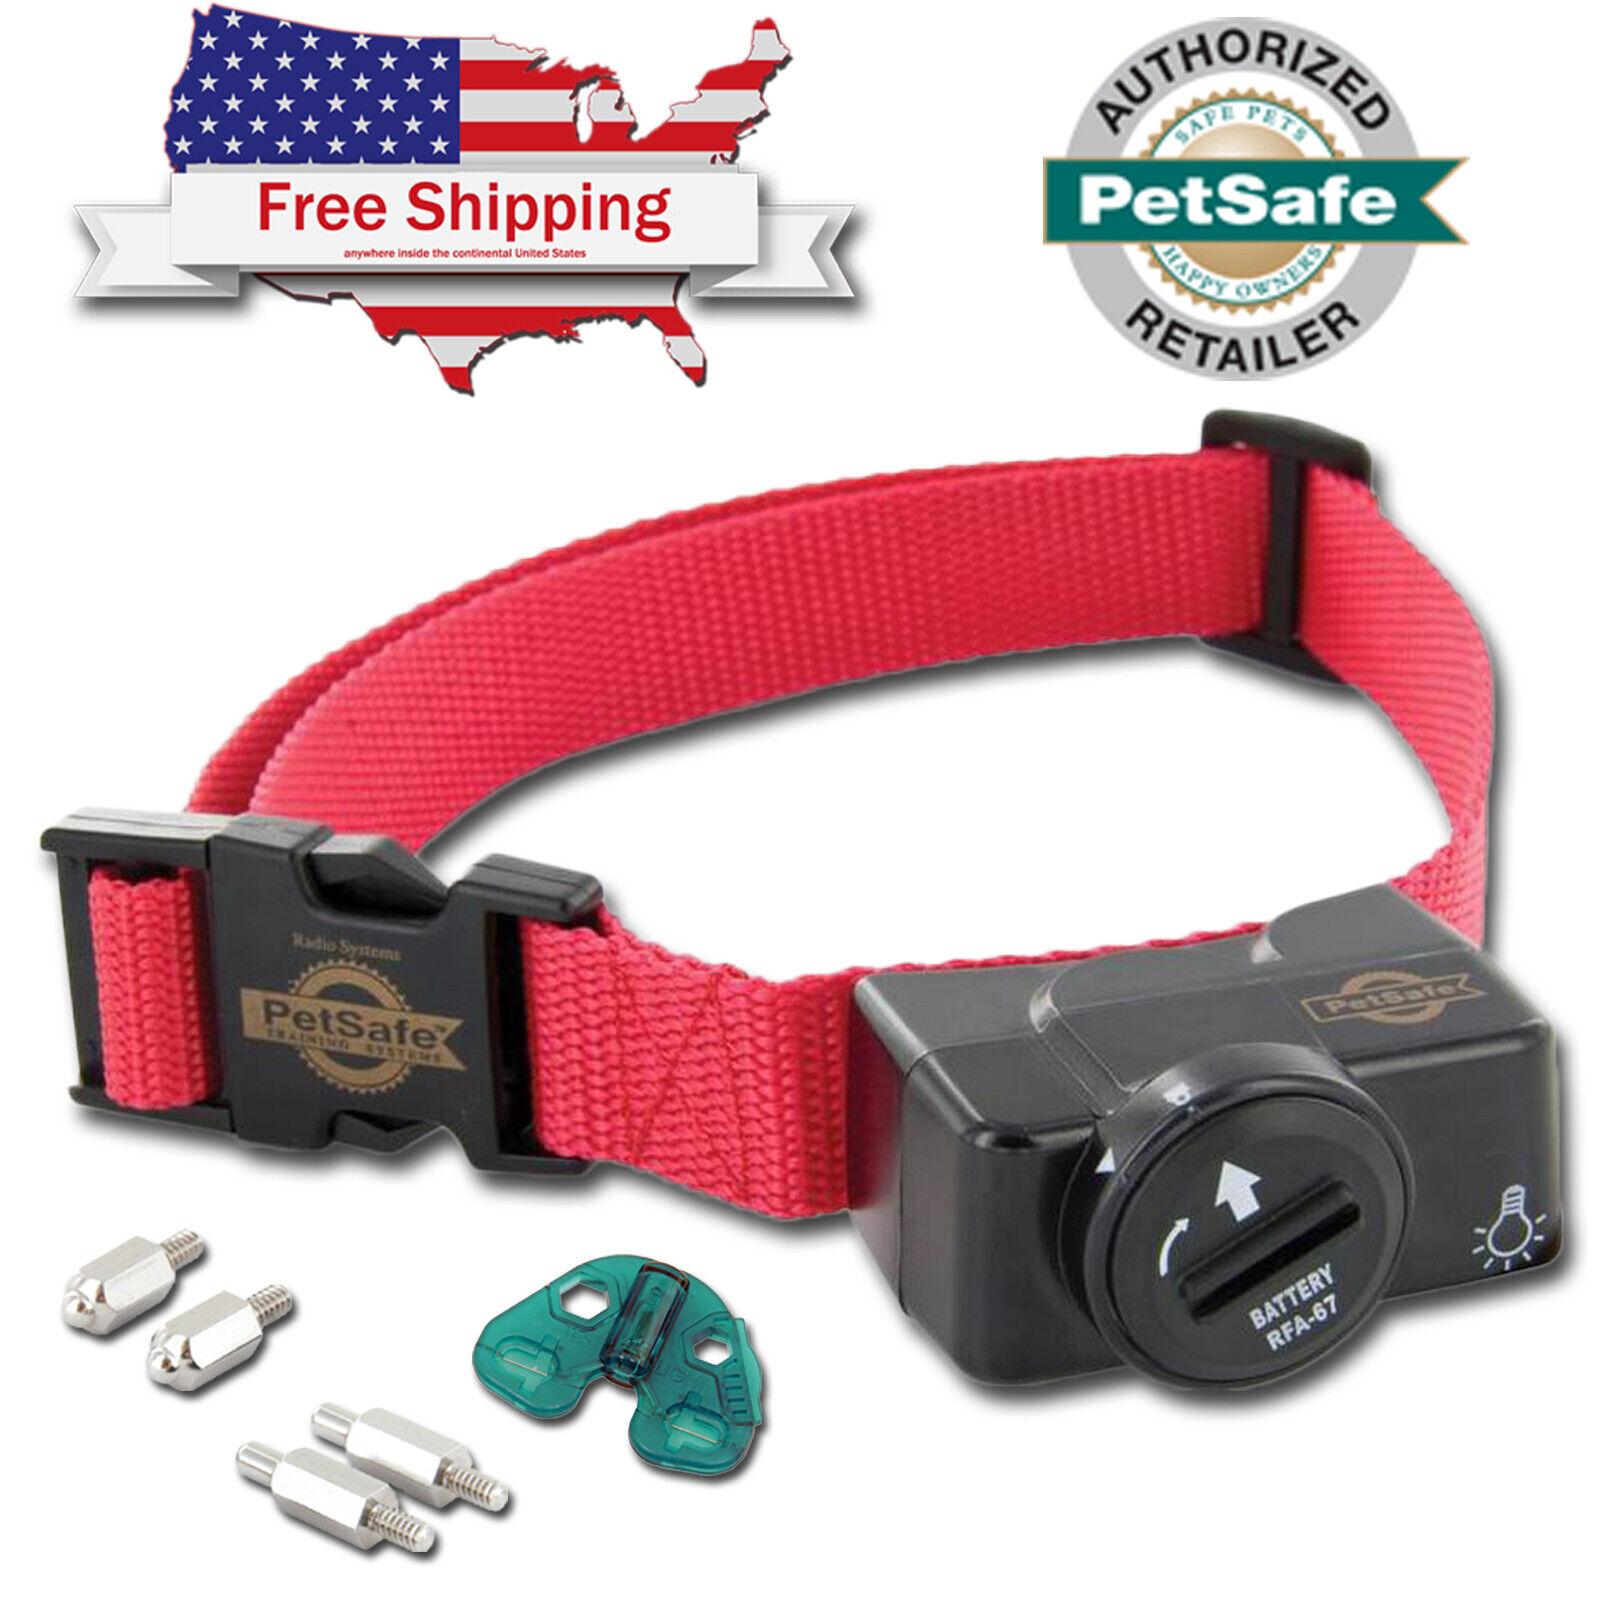 petsafe-wireless-dog-fence-receiver-pif-275-19-extra-shock-collar-pif-300-if-100